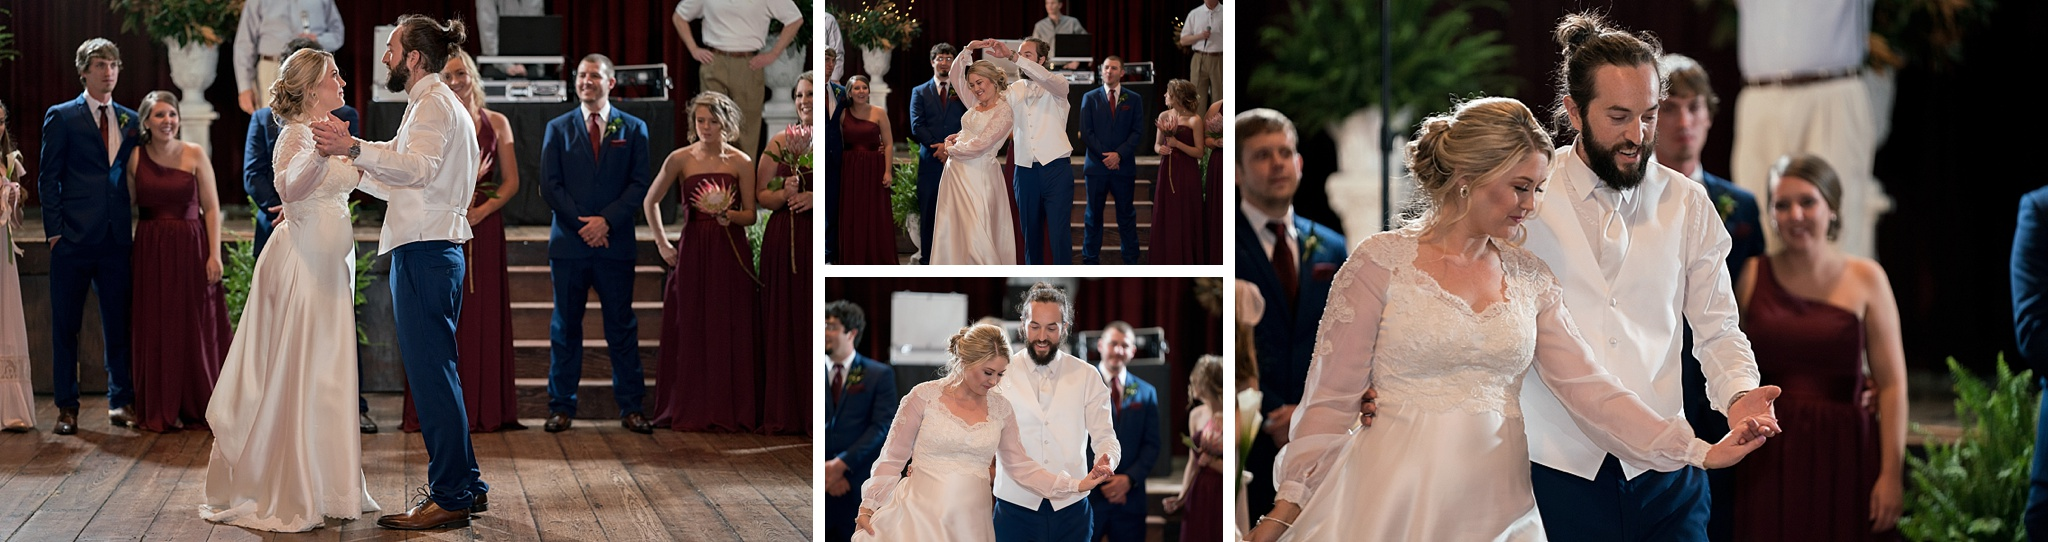 Washington-NC-Wedding-Photography-215.jpg